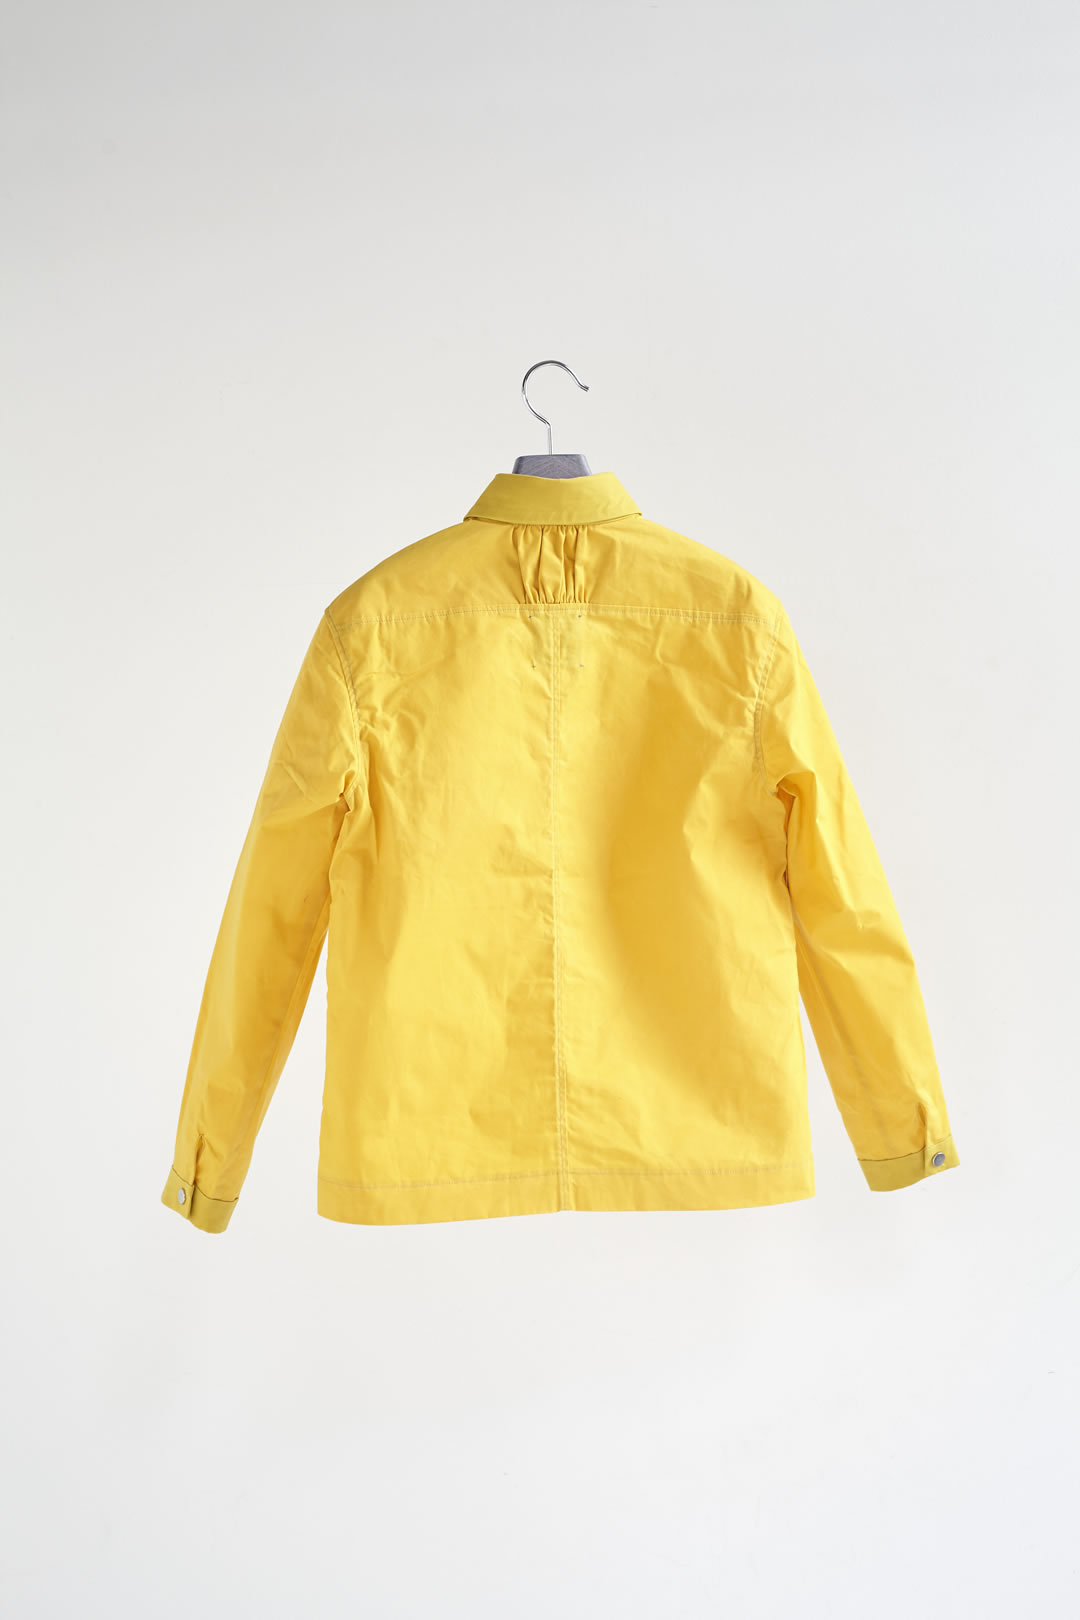 model.1 yellow